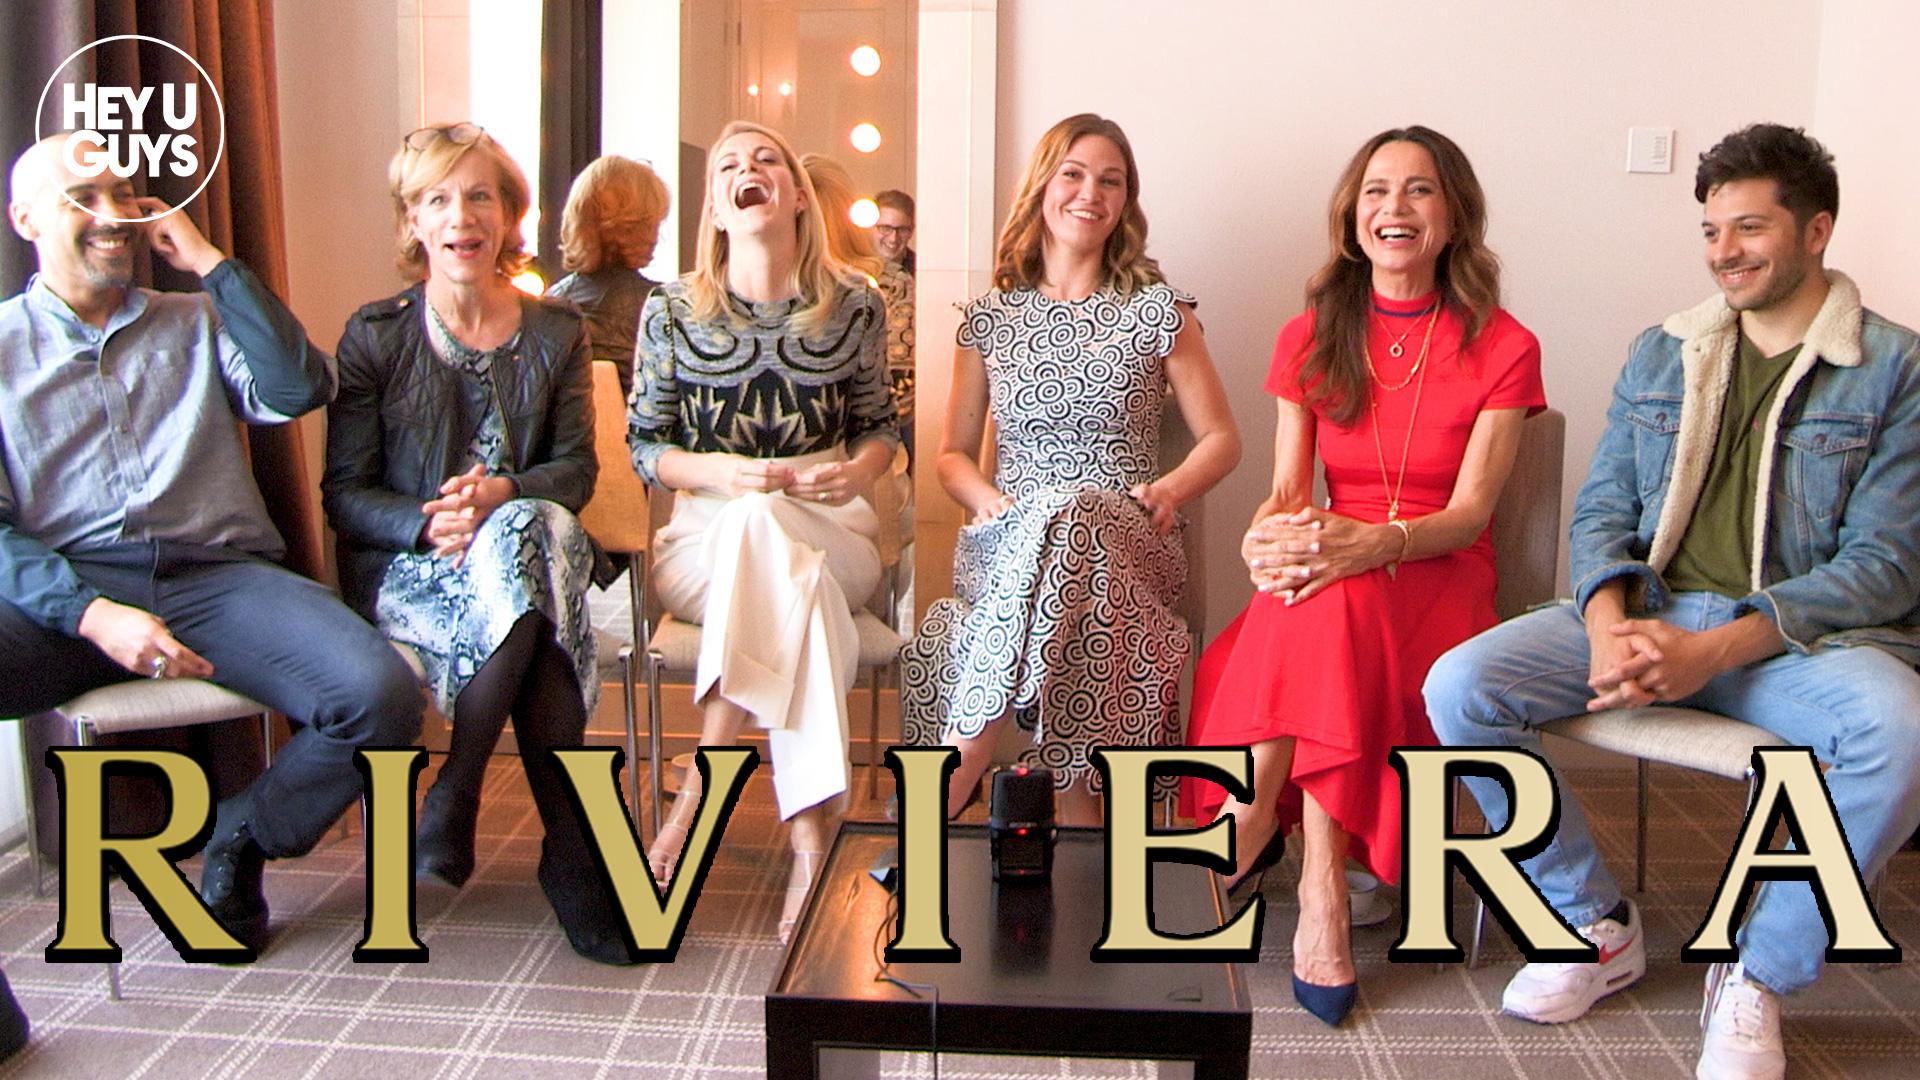 riviera cast interviews